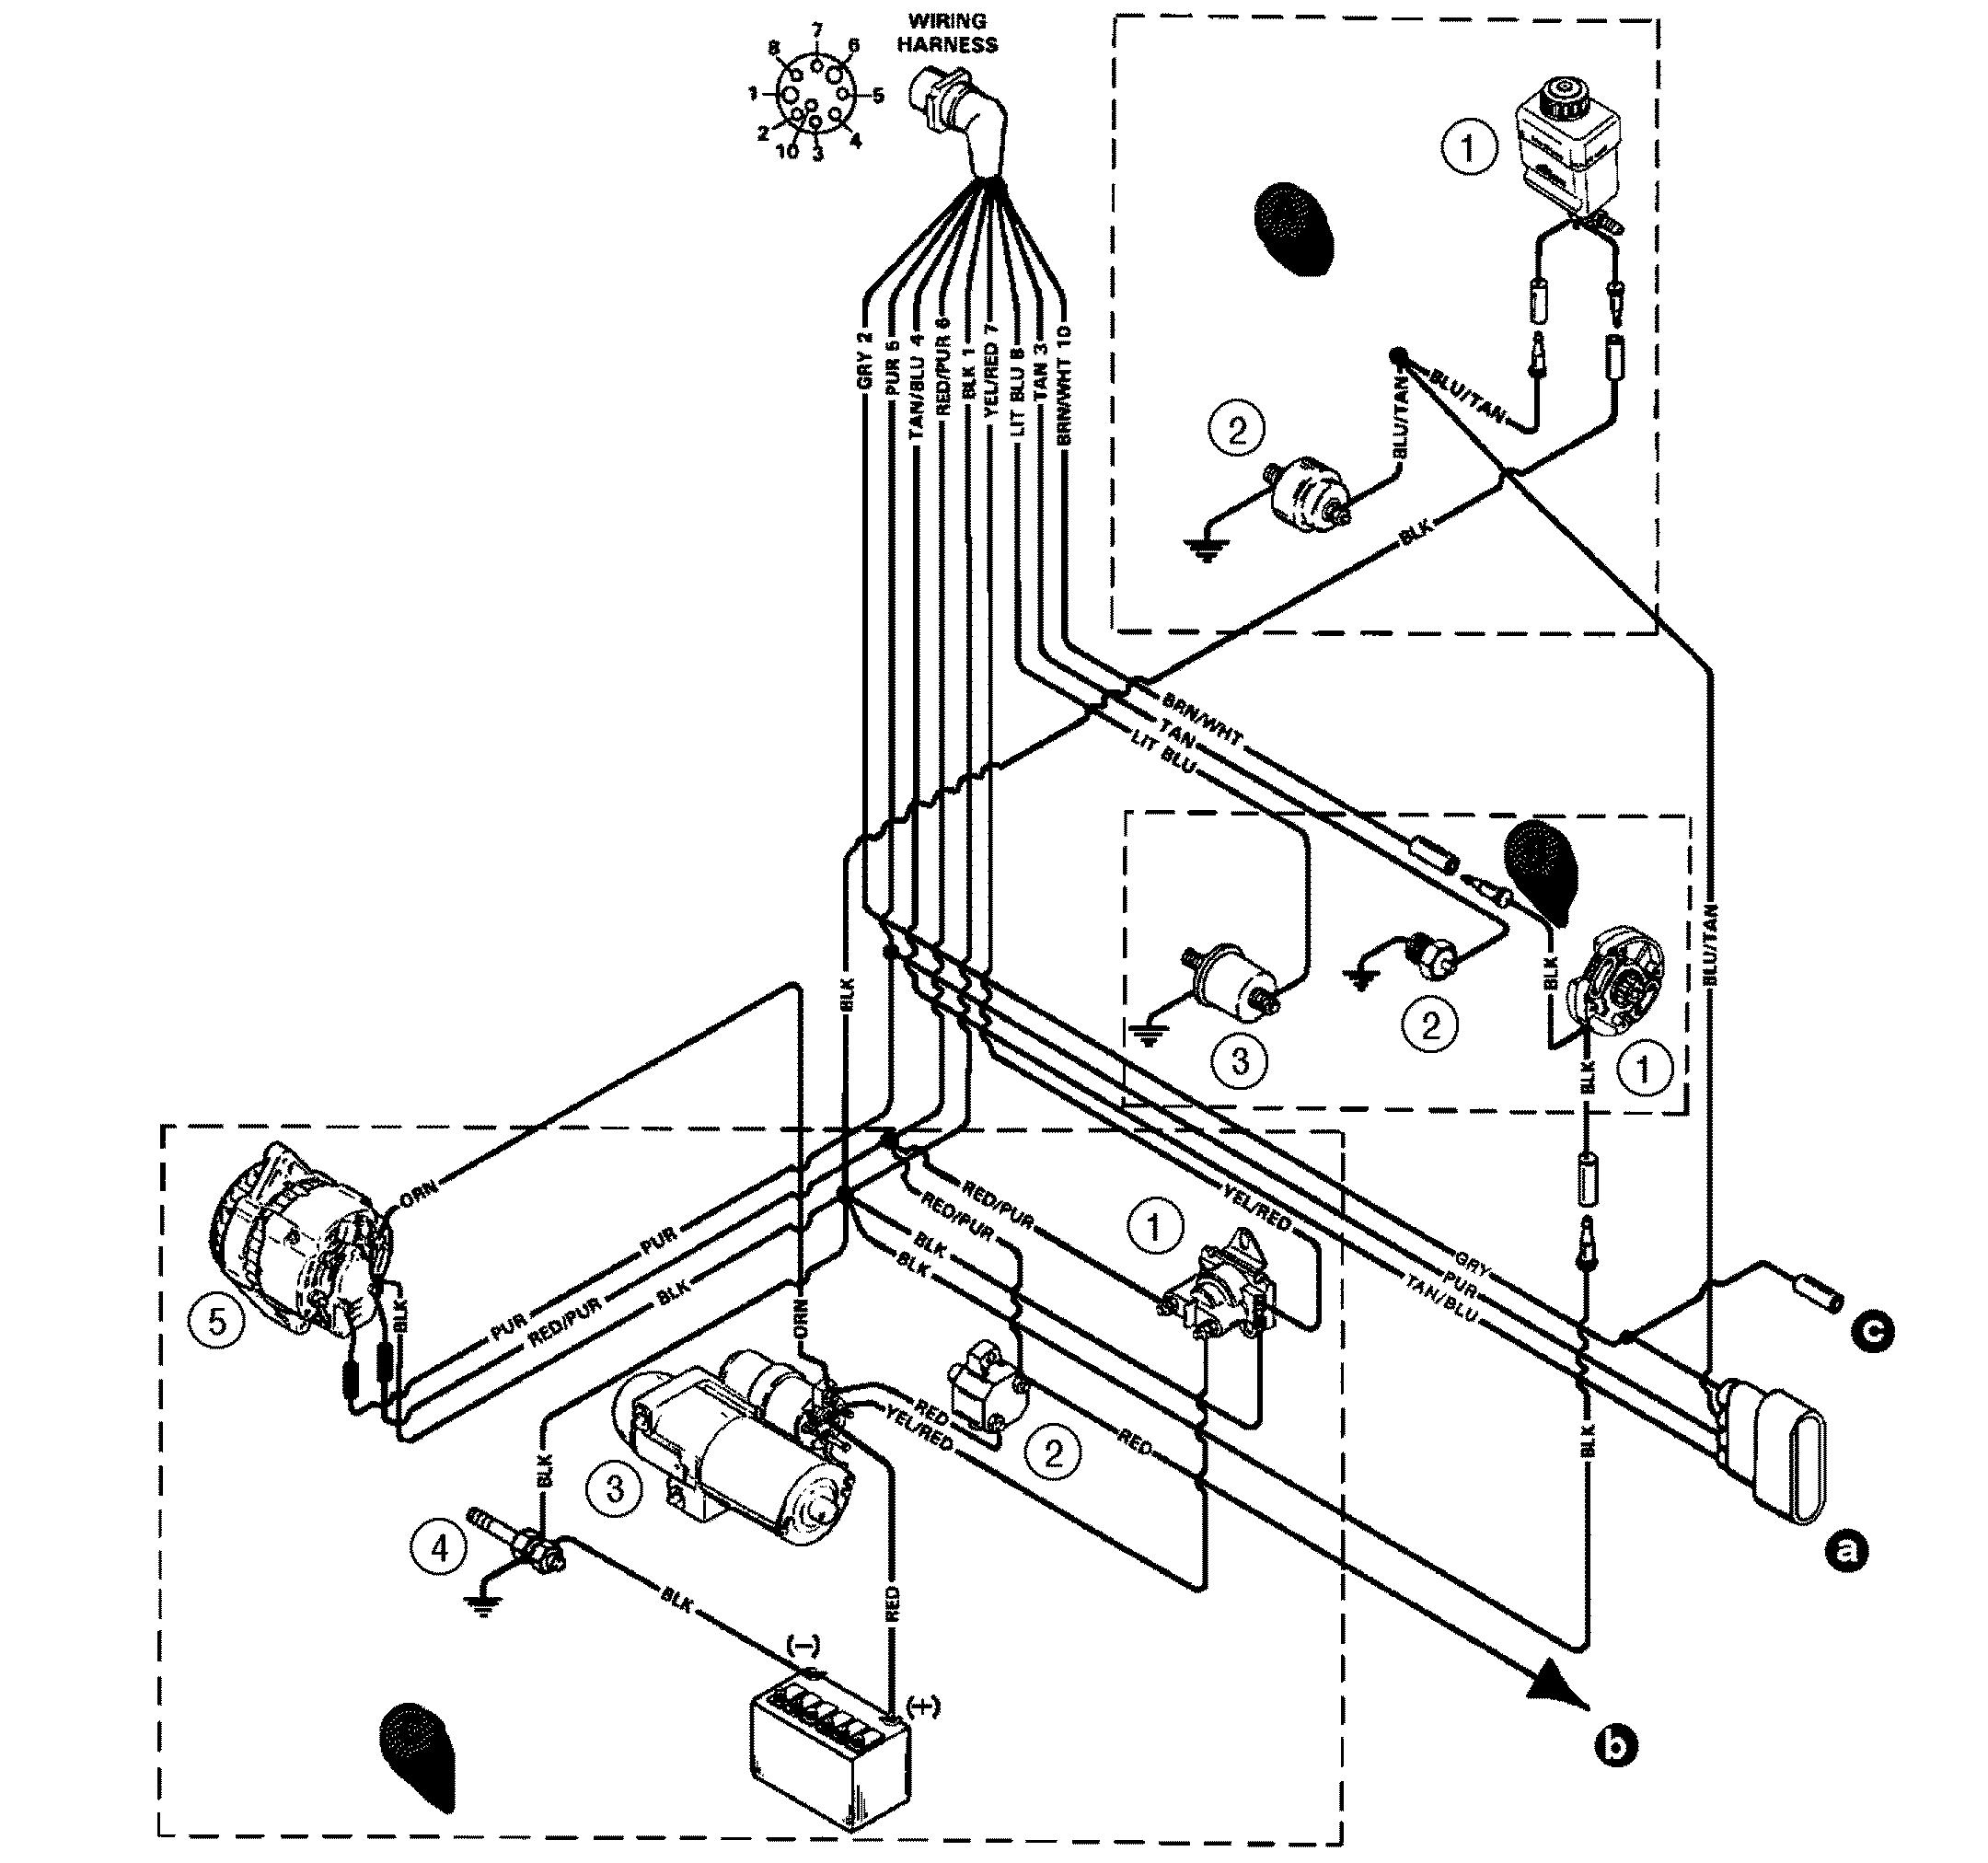 3?resize\\\=665%2C623\\\&ssl\\\=1 mercruiser wiring diagram mercruiser alternator wiring diagram mercruiser trim wiring diagram at gsmportal.co